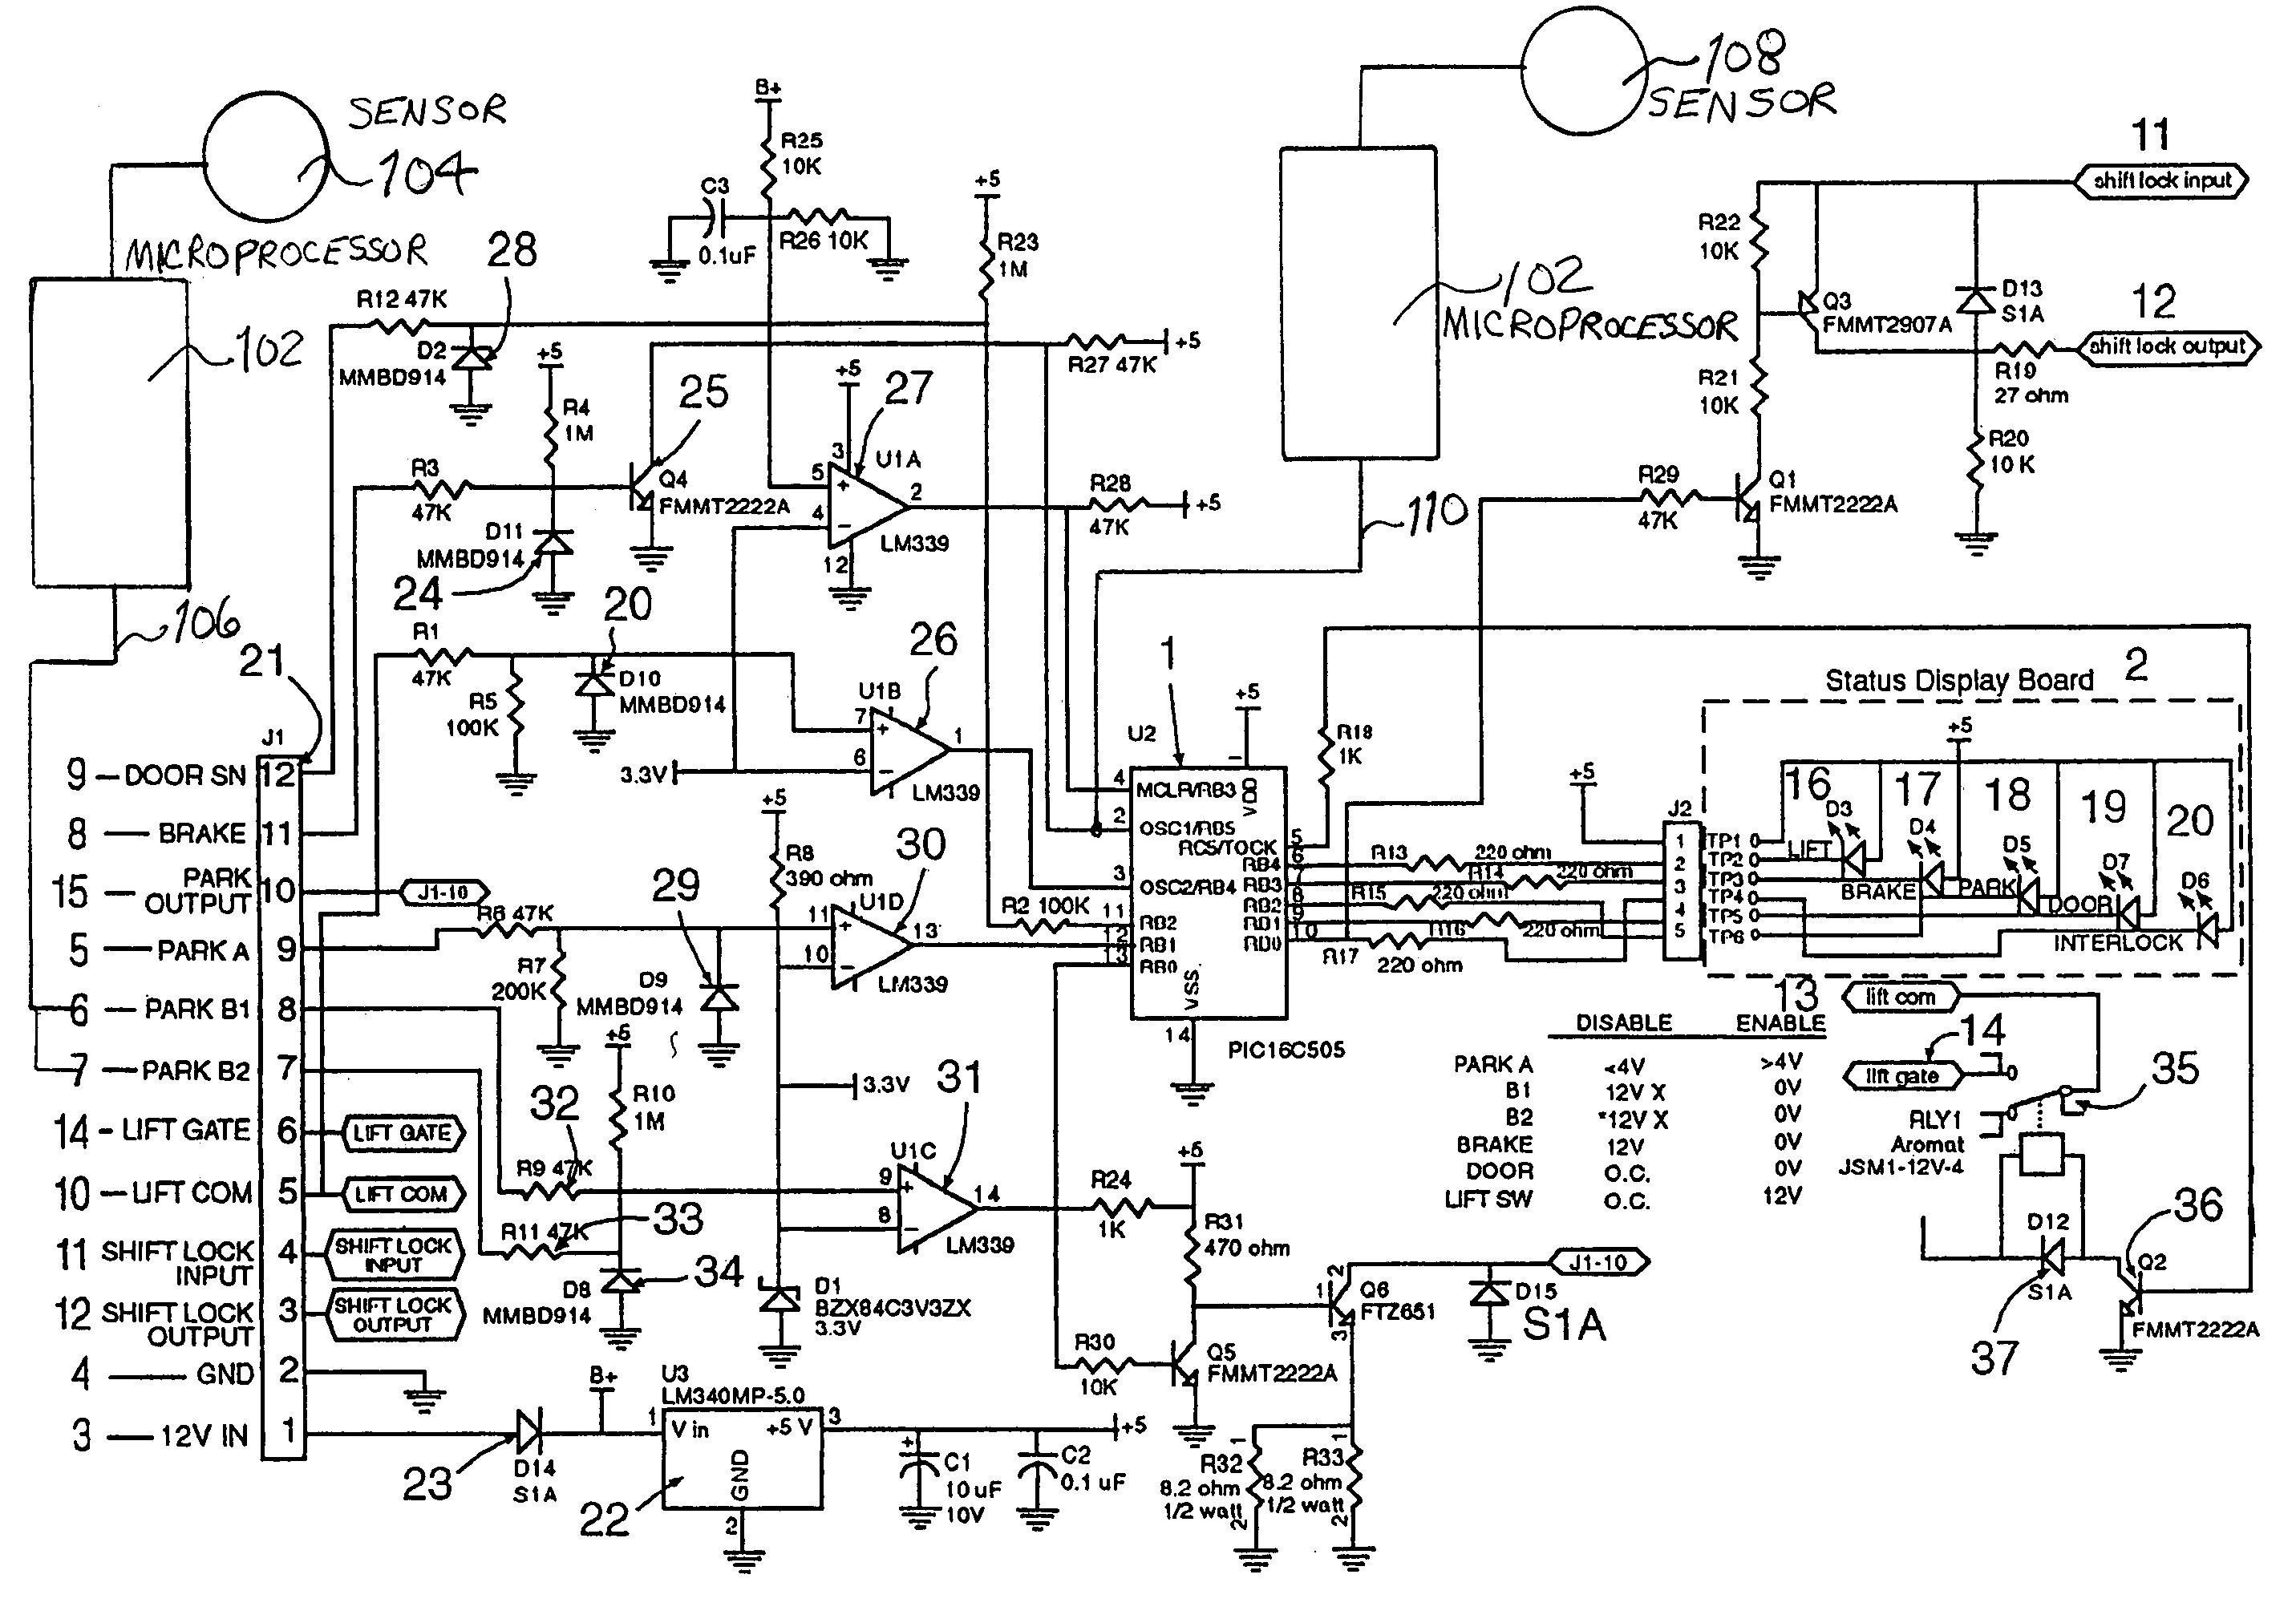 rheem rhllhm3617ja wiring diagram airport instrument legend braun wheelchair lift download sample ricon stannah stair 19 n